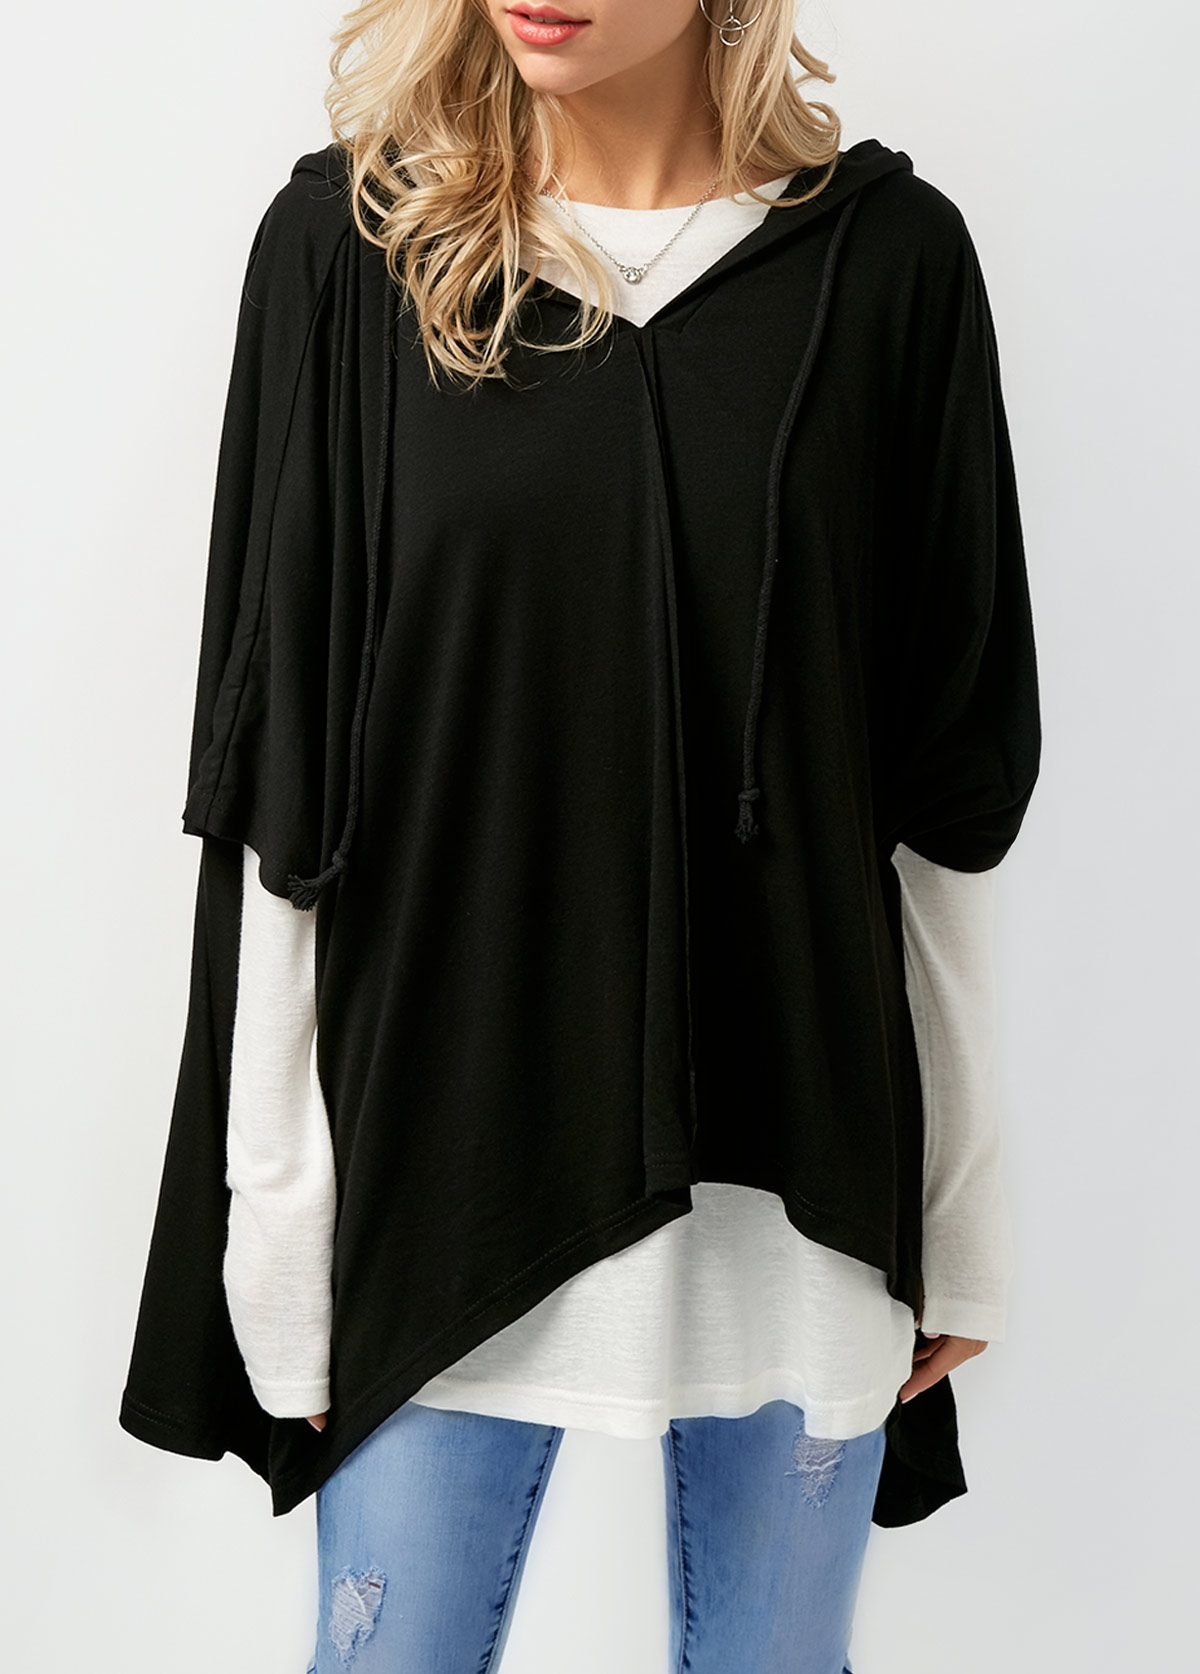 Long Sleeve T Shirt and Asymmetric Hem Black Hoodie